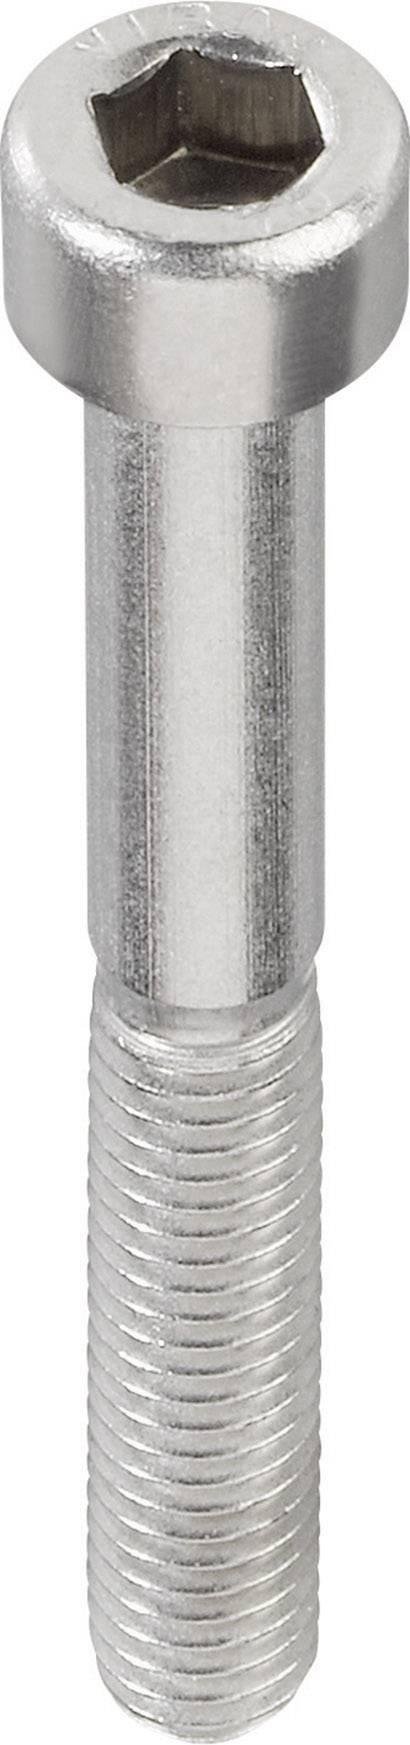 Cylindre Vis tête cylindrique en acier inoxydable m4x30-din912